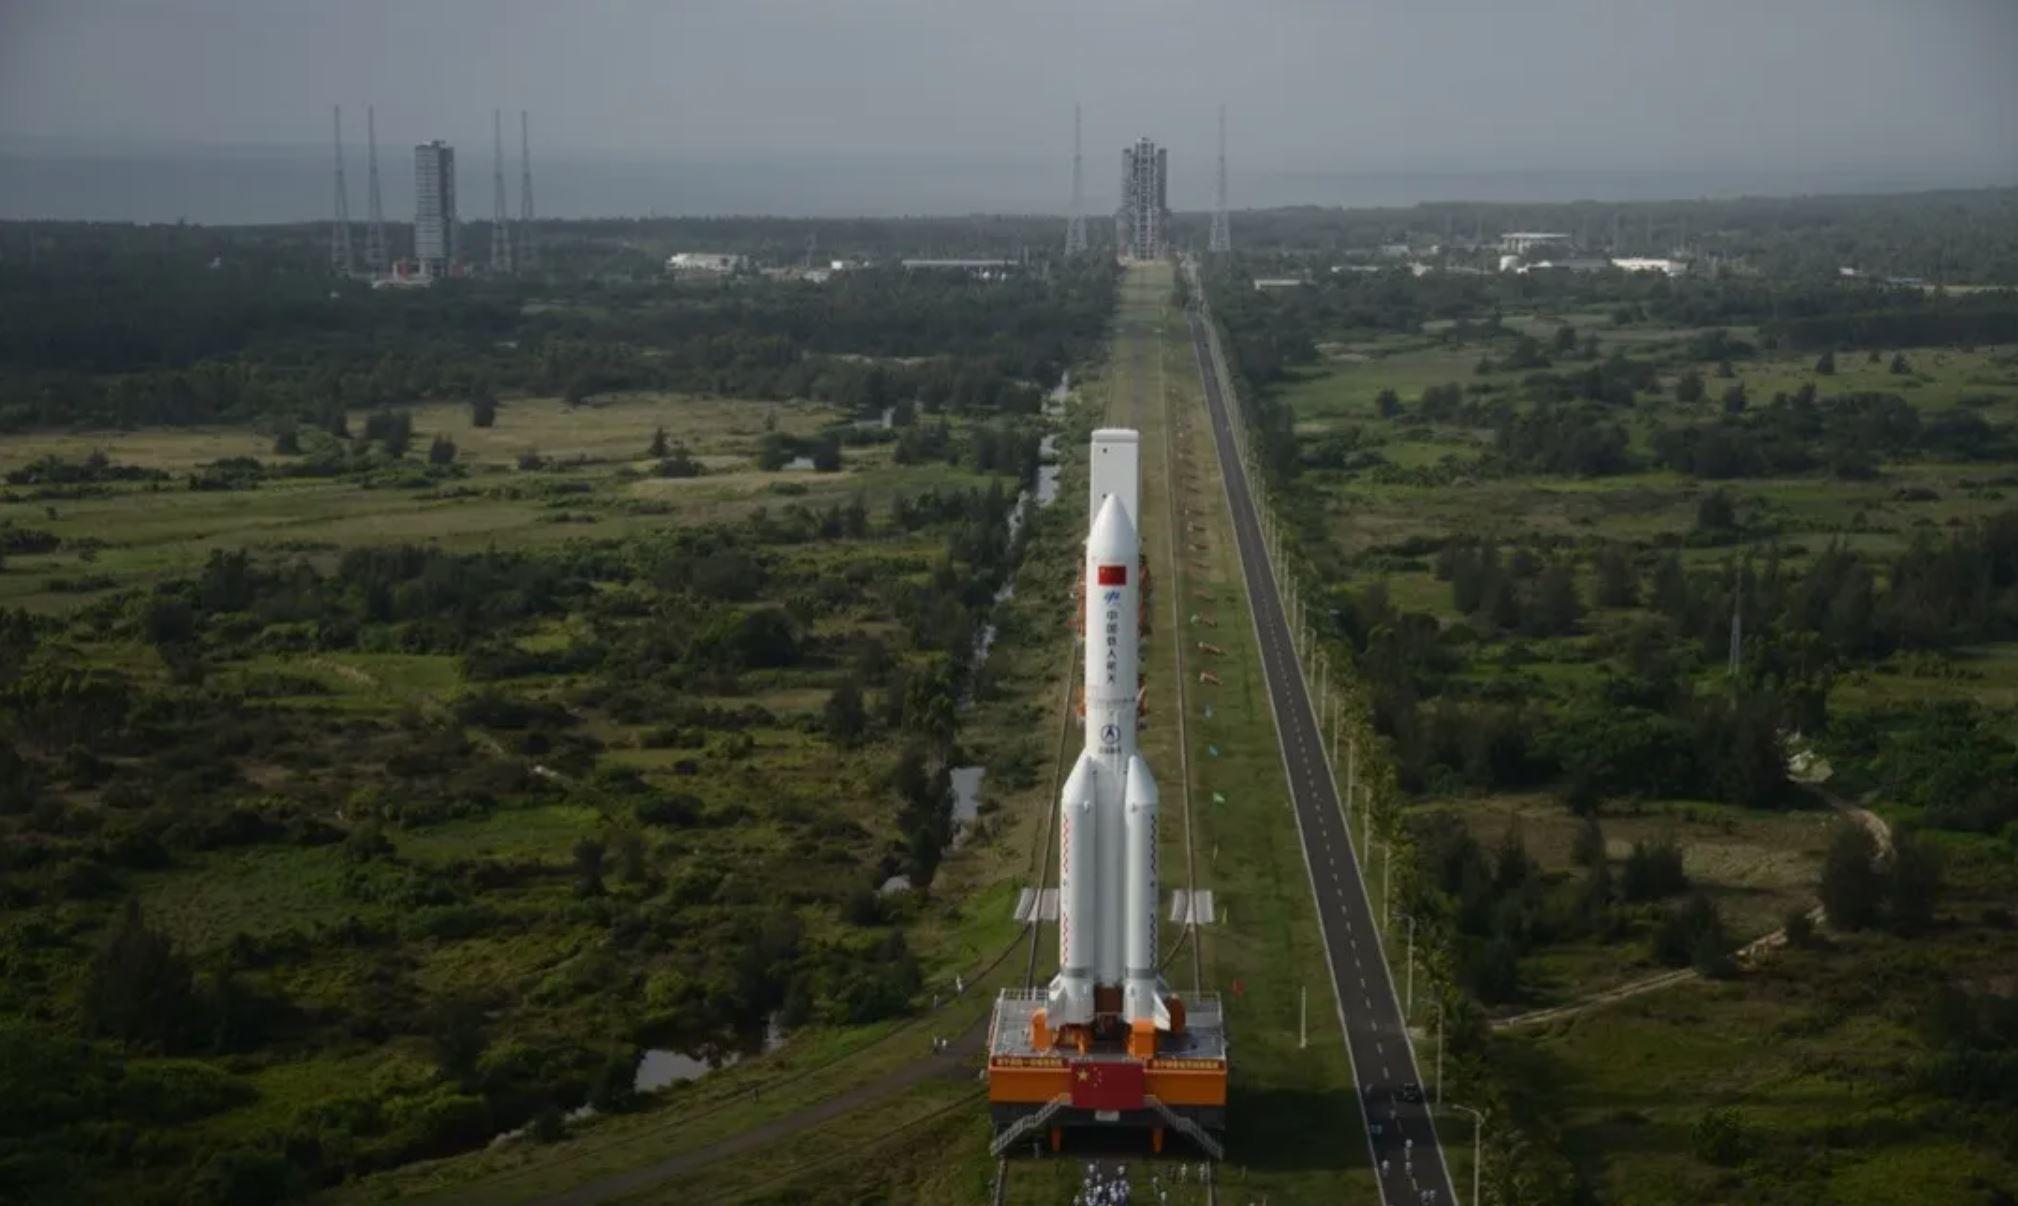 Chinese rocket stage predicted to reenter atmosphere around May 8 -  SpaceNews